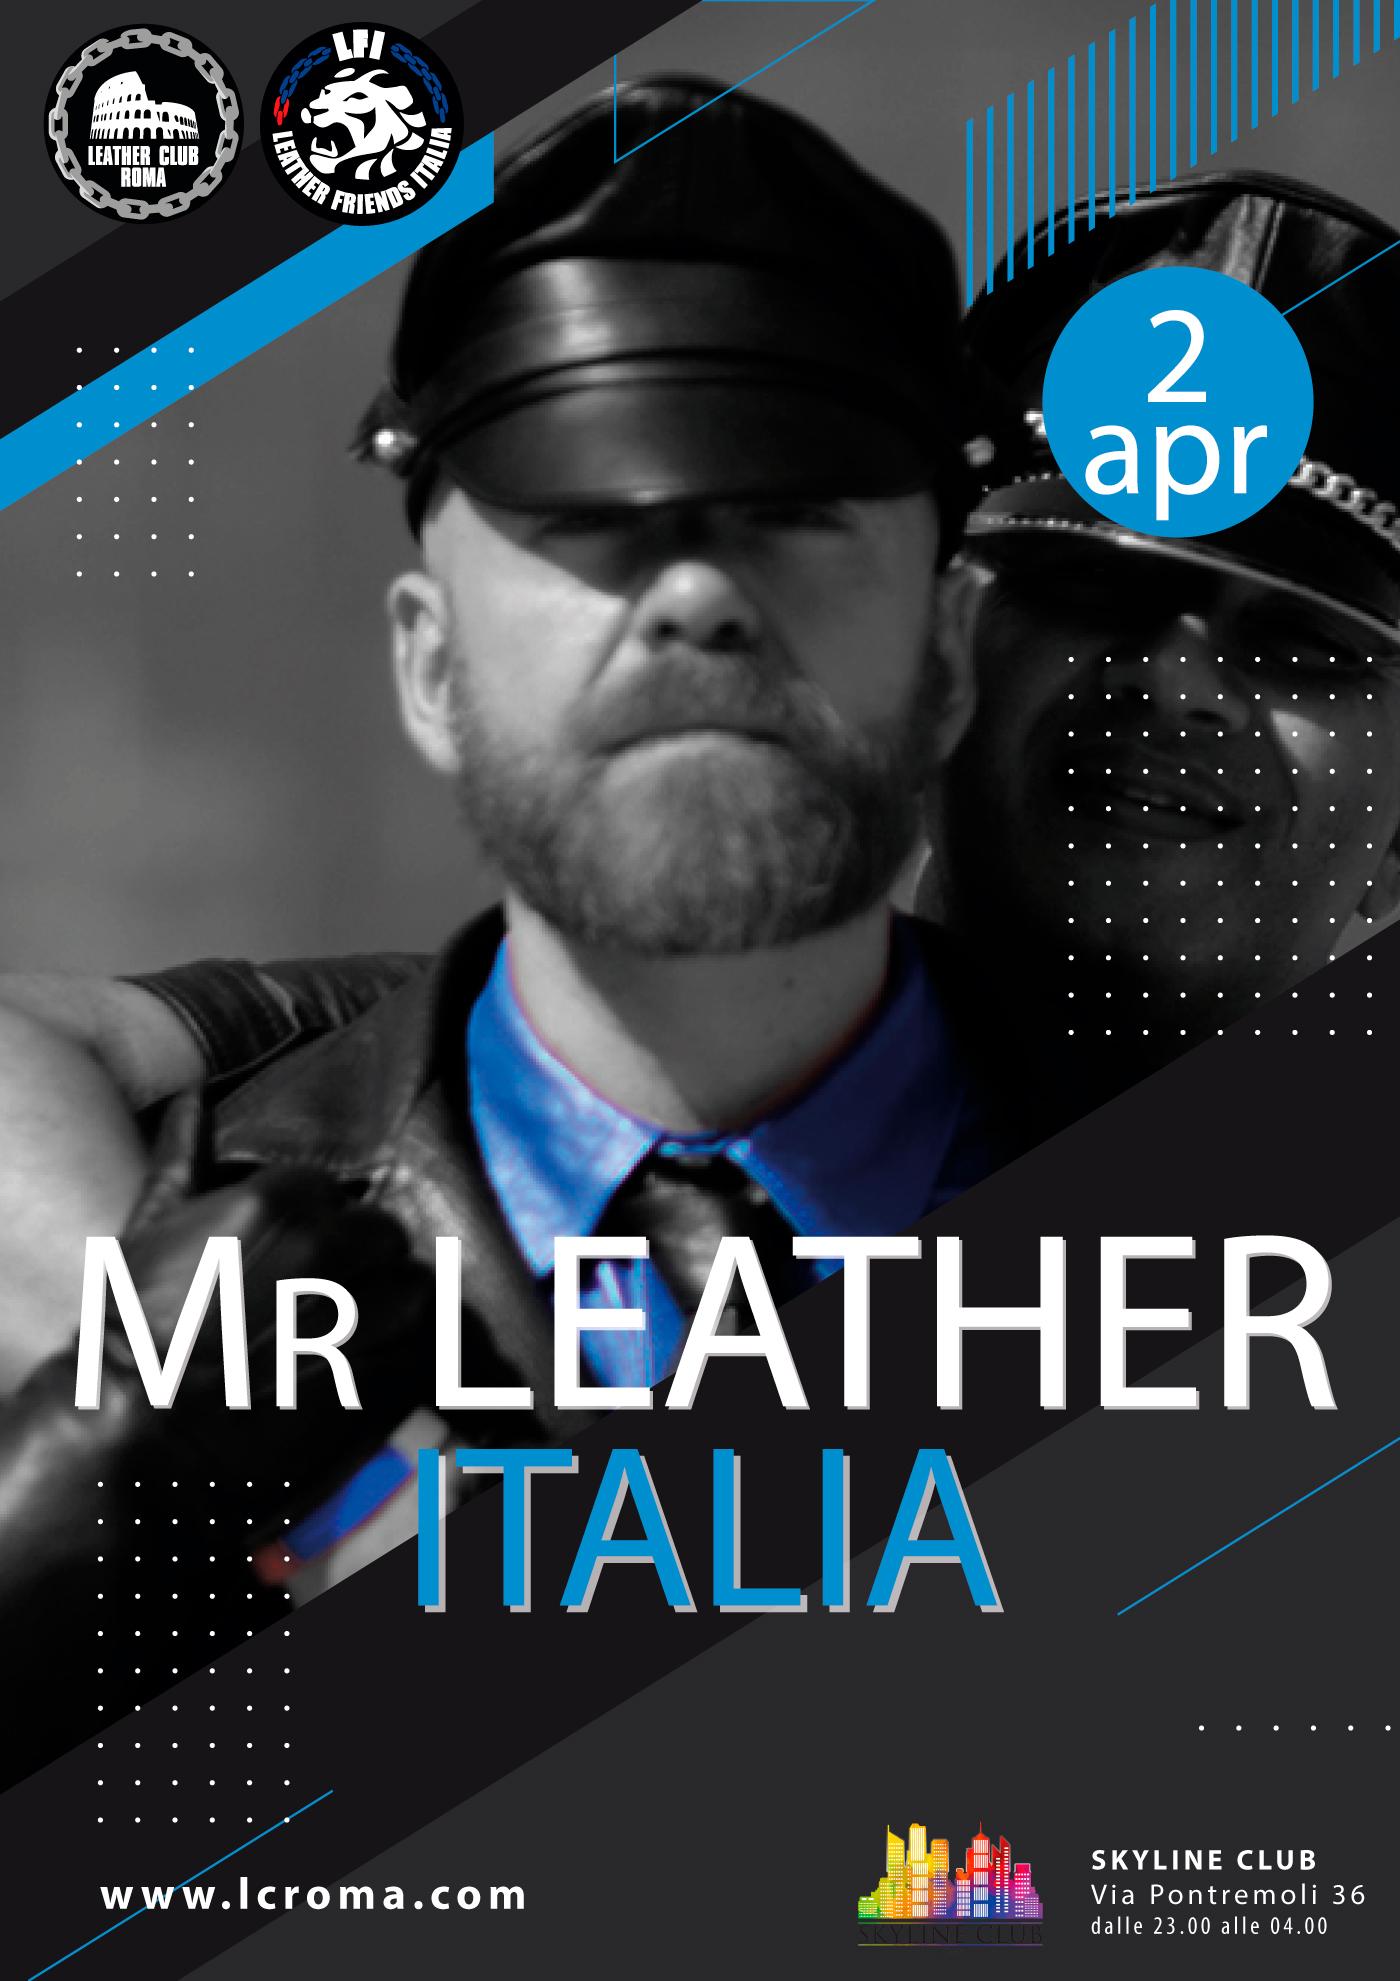 Mister-Leather-Italia-2-Aprile-2022